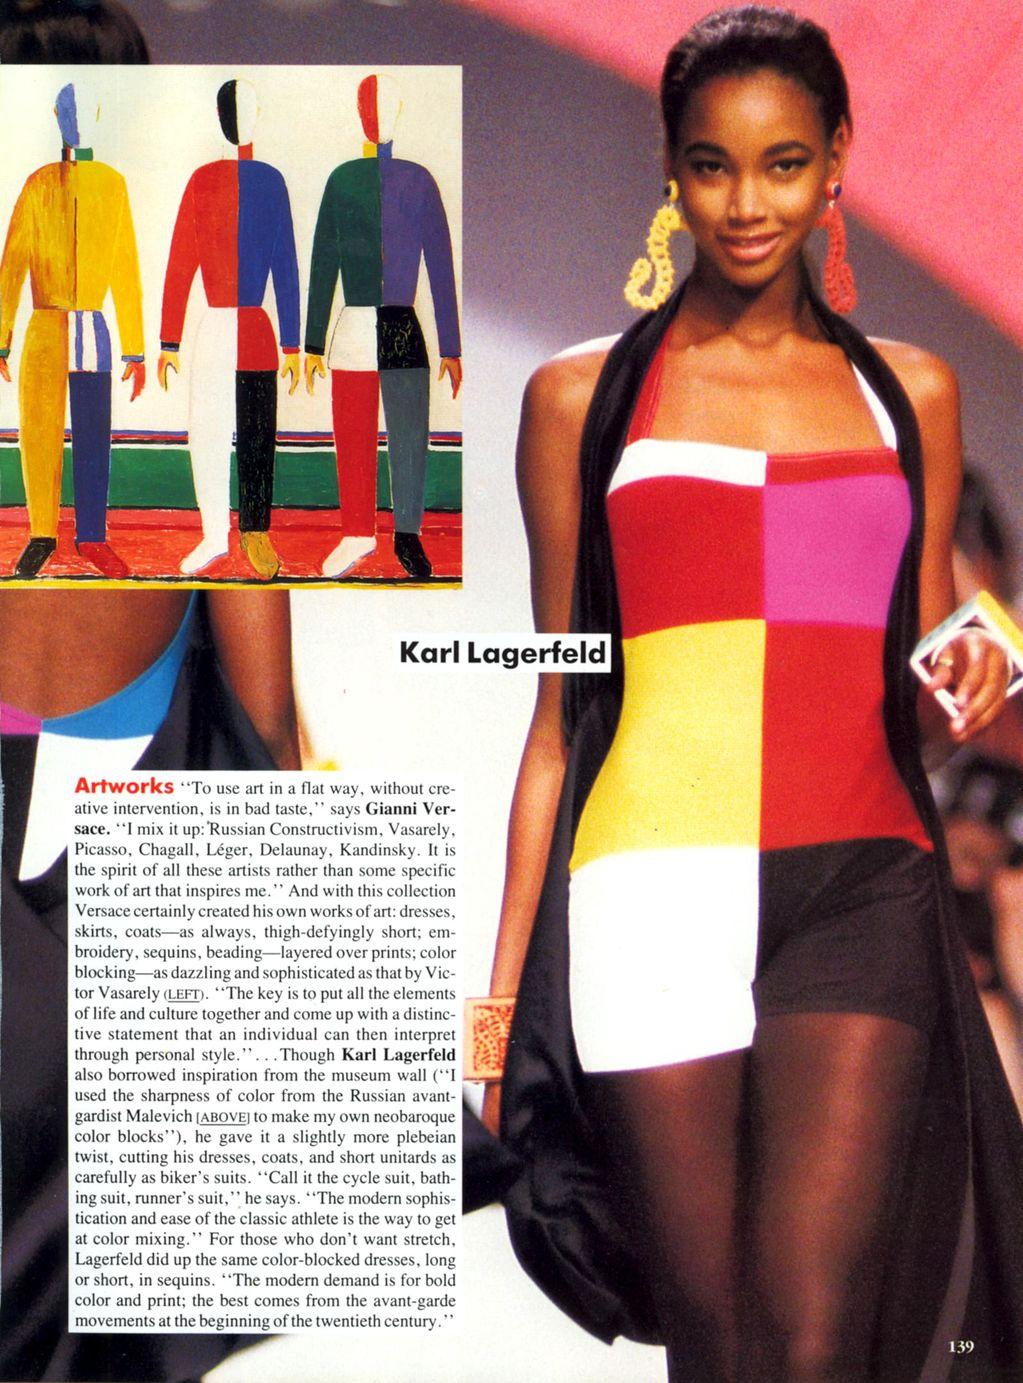 Vogue (US) January 1991 | Fashion 1991 08.jpg